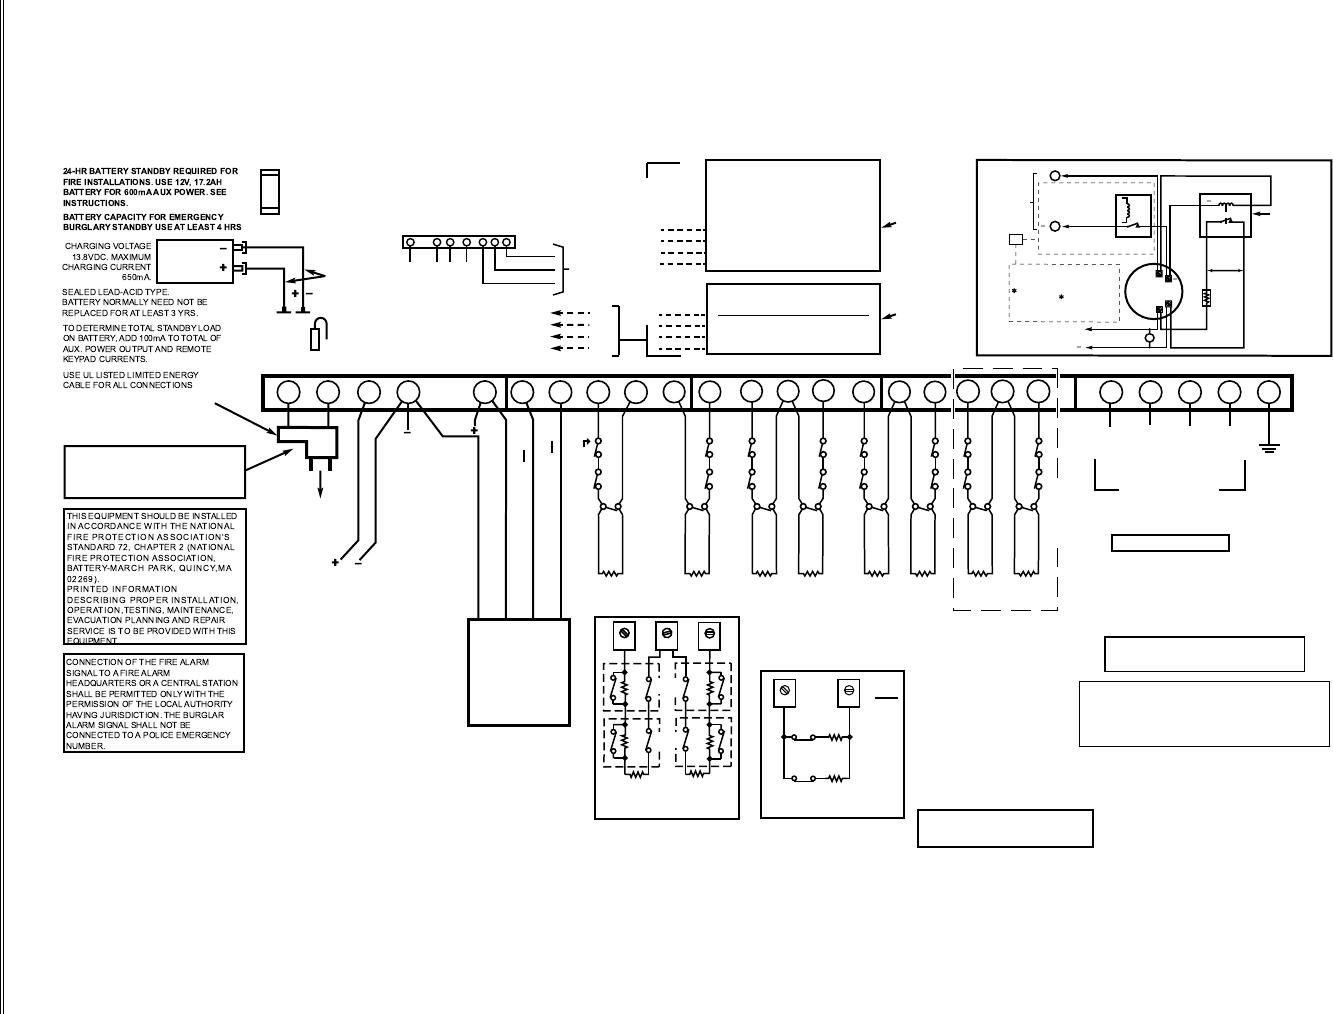 Fa168cps V5 Installation Manual Tags Hh H Telecaster Cableado Wiring Diagrama Diagram